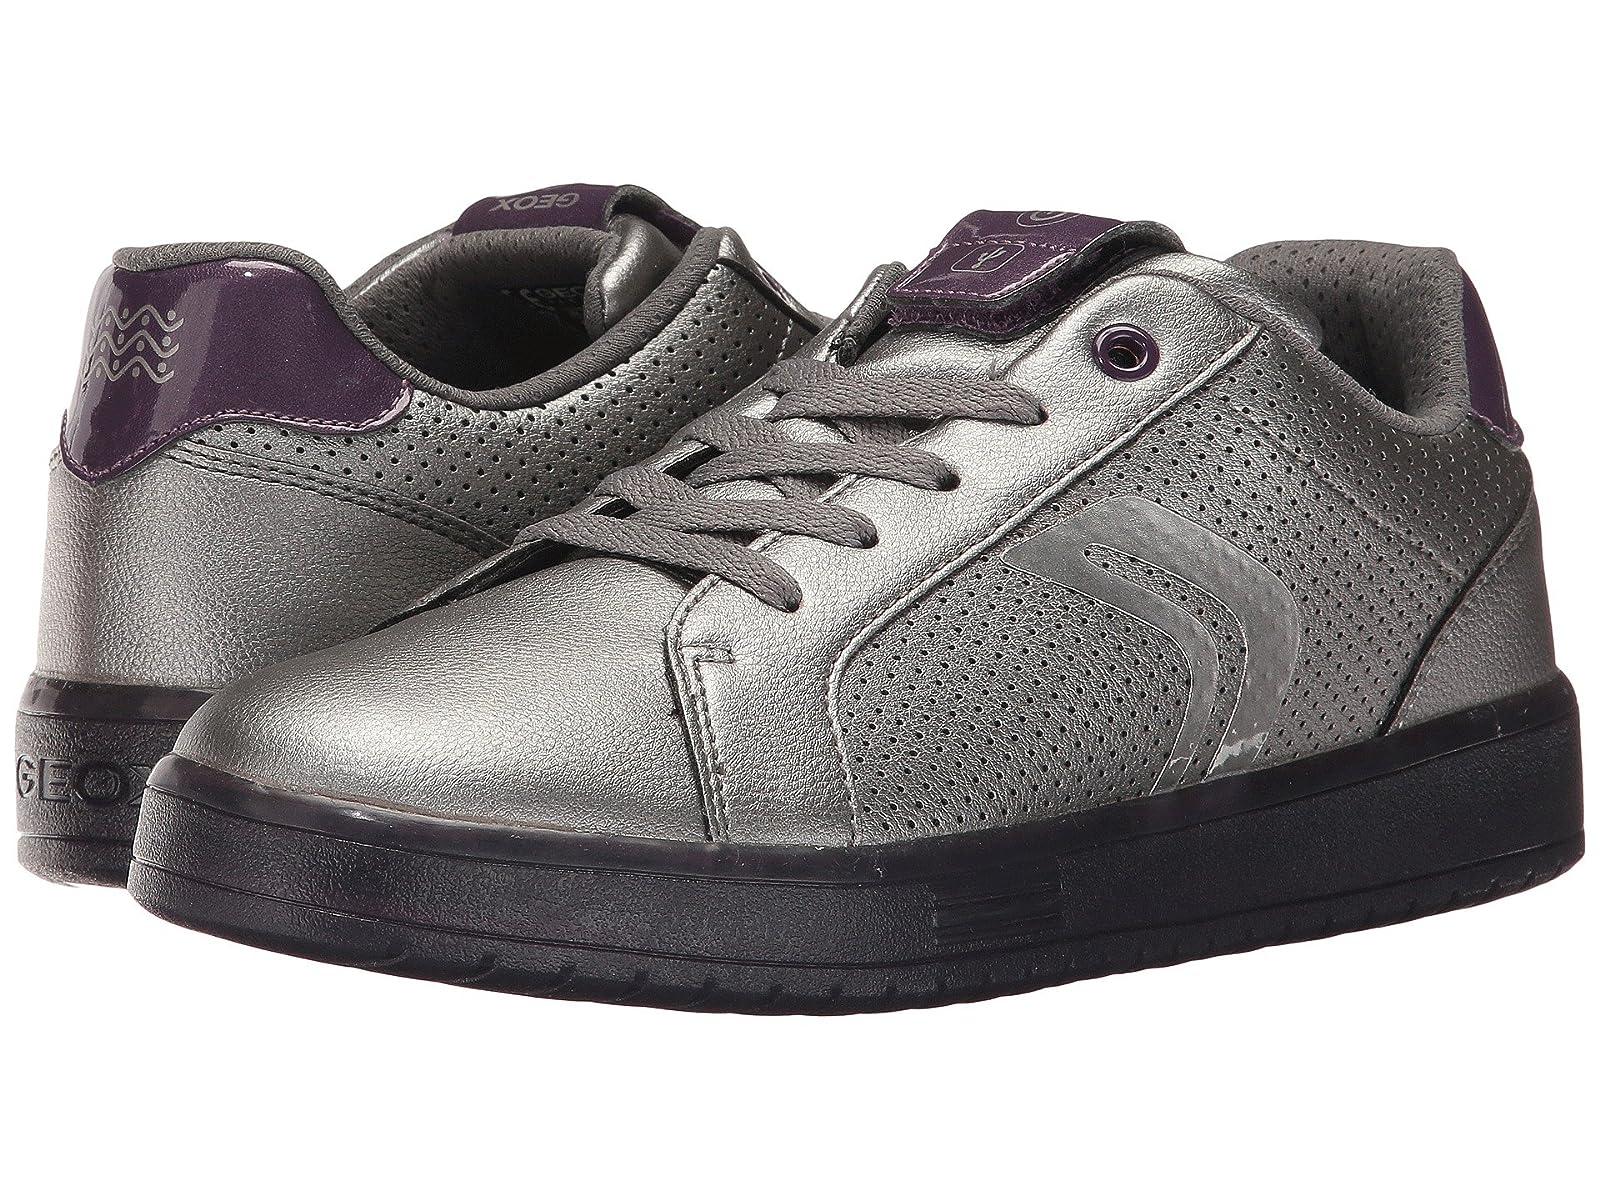 Geox Kids JR Kommodor Girl 2 (Big Kid)Cheap and distinctive eye-catching shoes